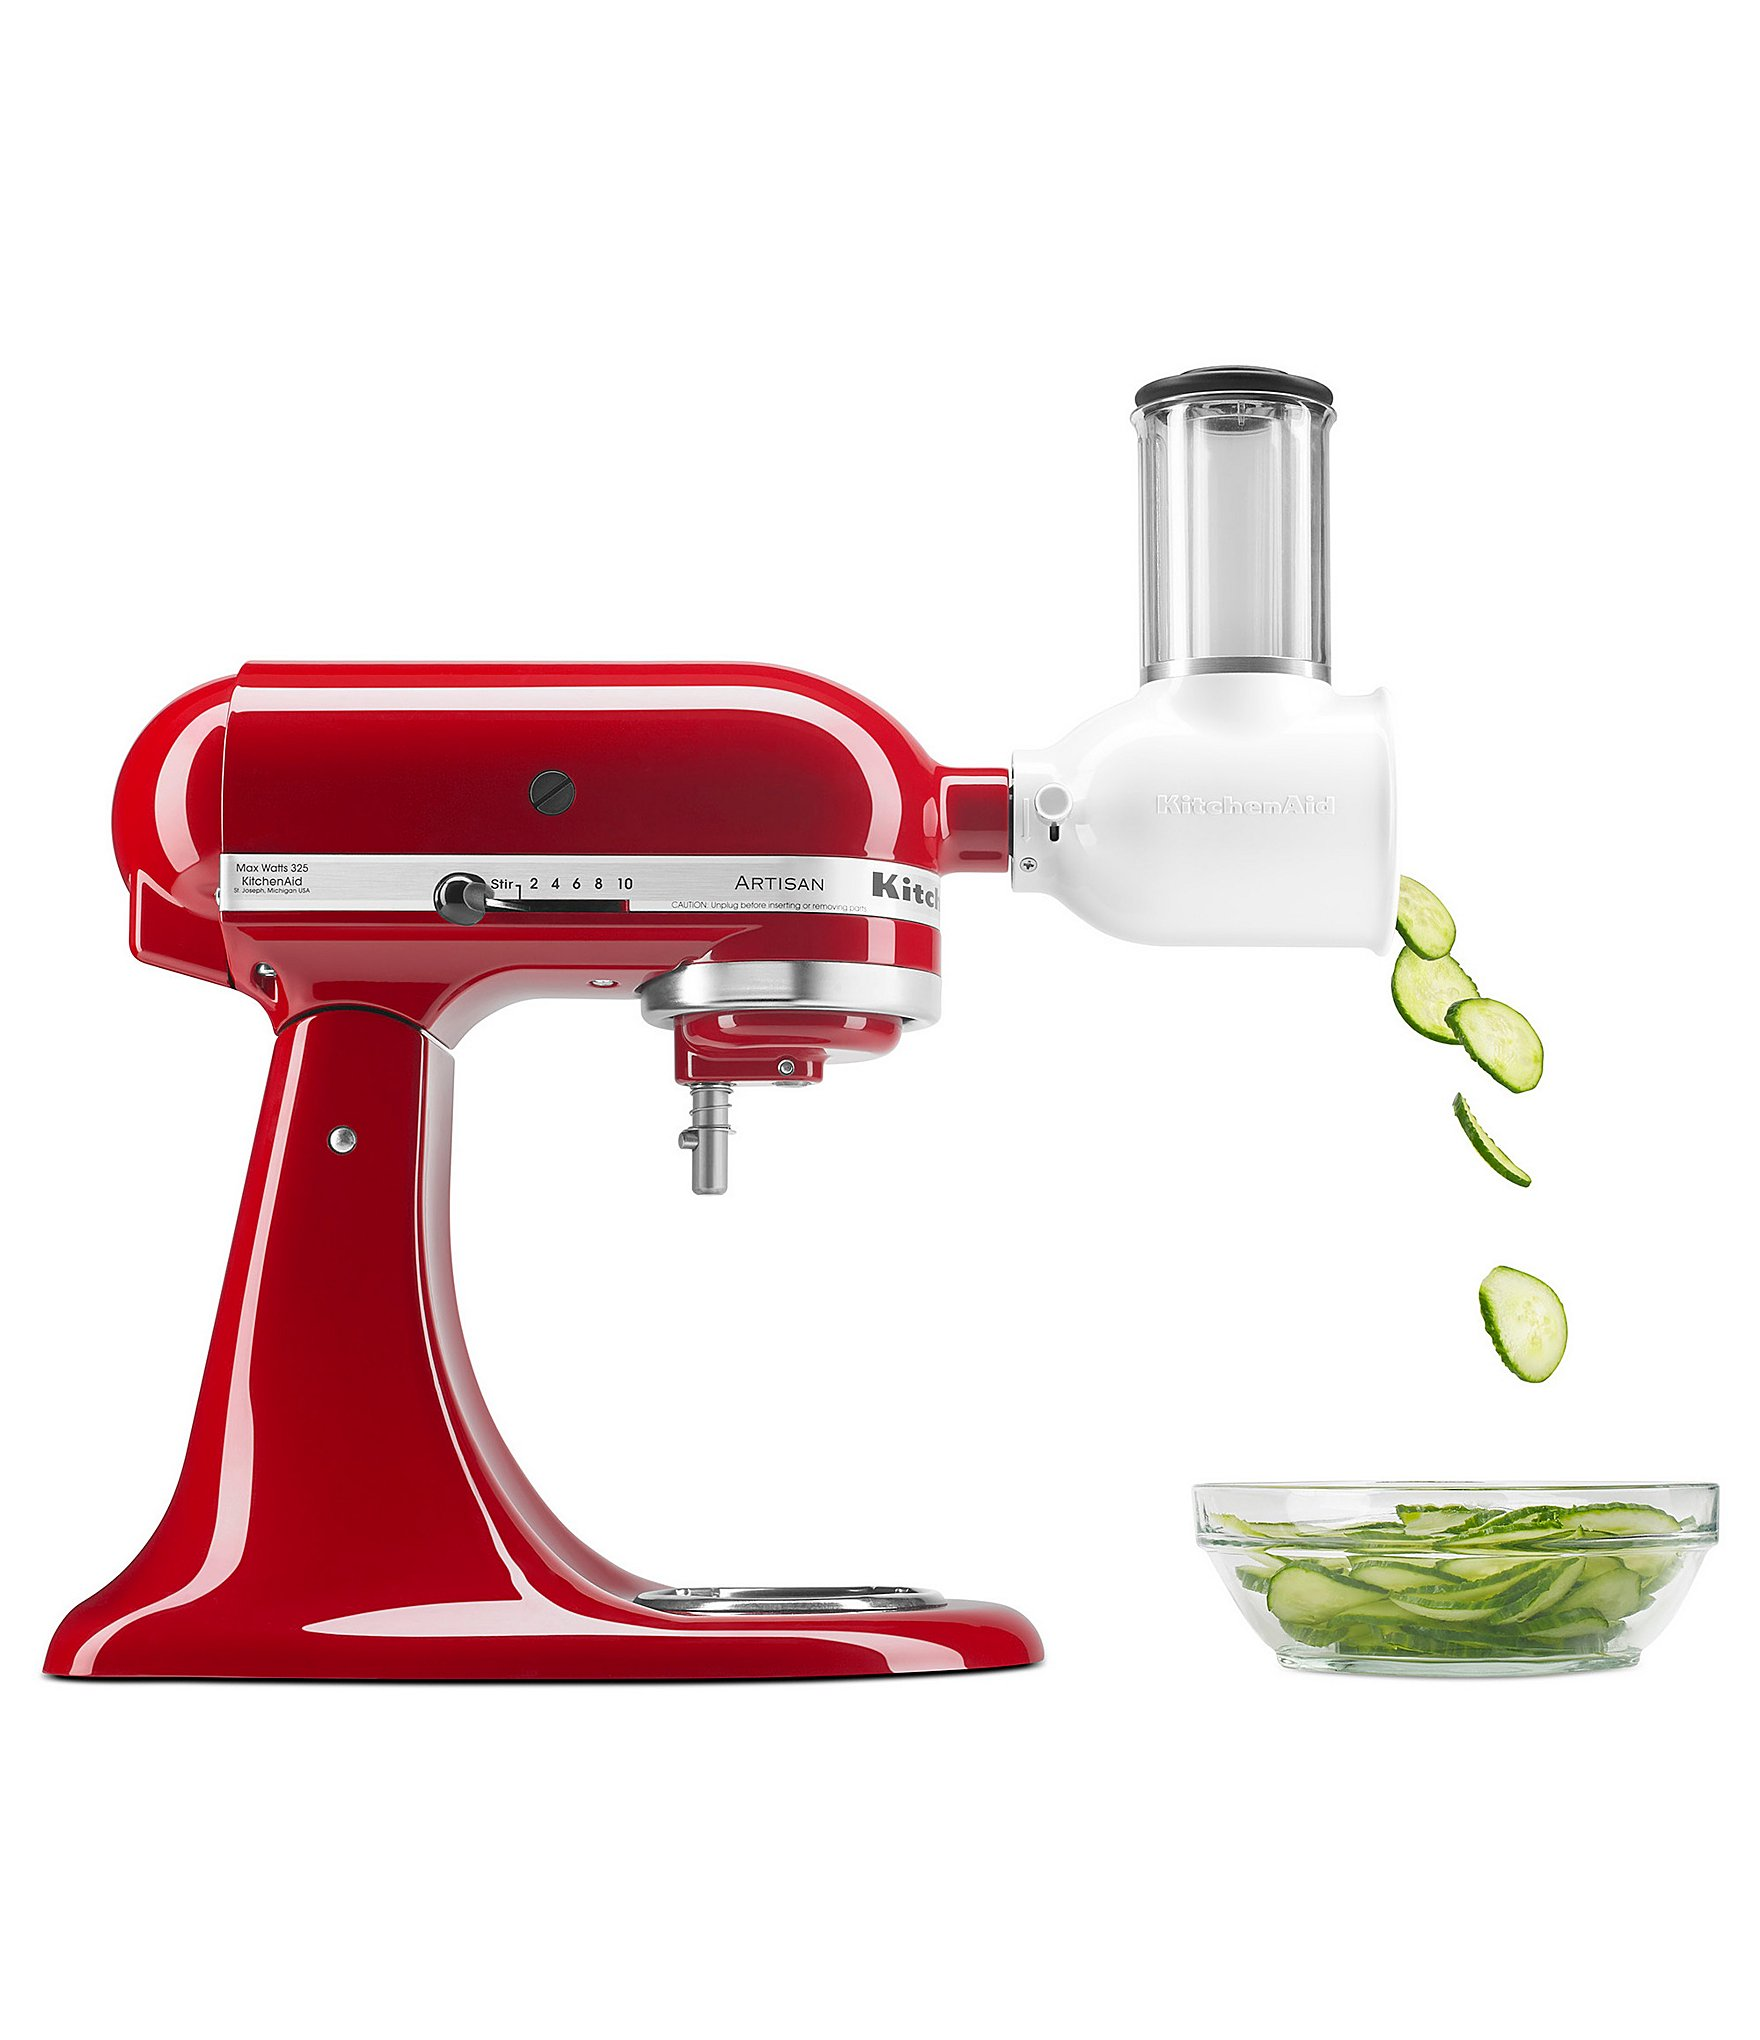 KitchenAid Small Kitchen Appliances | Dillards